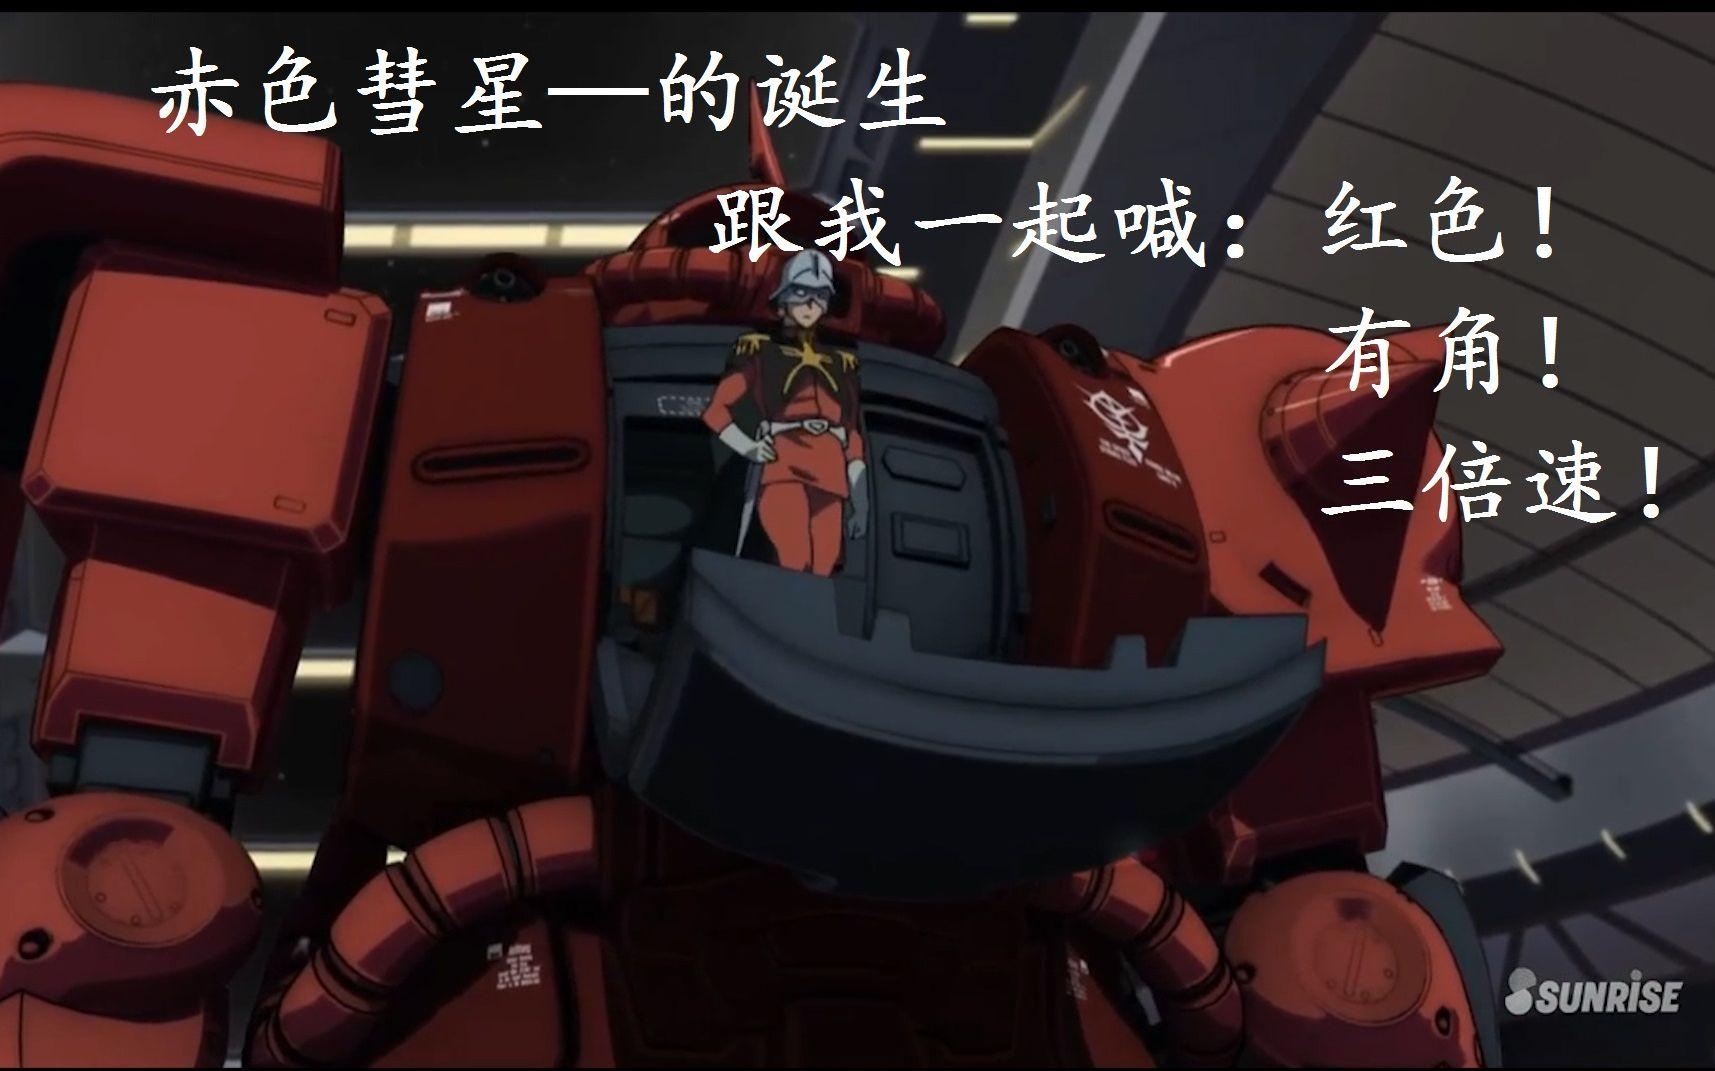 【高達 THE ORIGIN/夏亞/1080/MAD】赤色彗星的誕生——紅色!有角!三倍速!_嗶哩嗶哩 (゜-゜)つロ 干杯~-bilibili